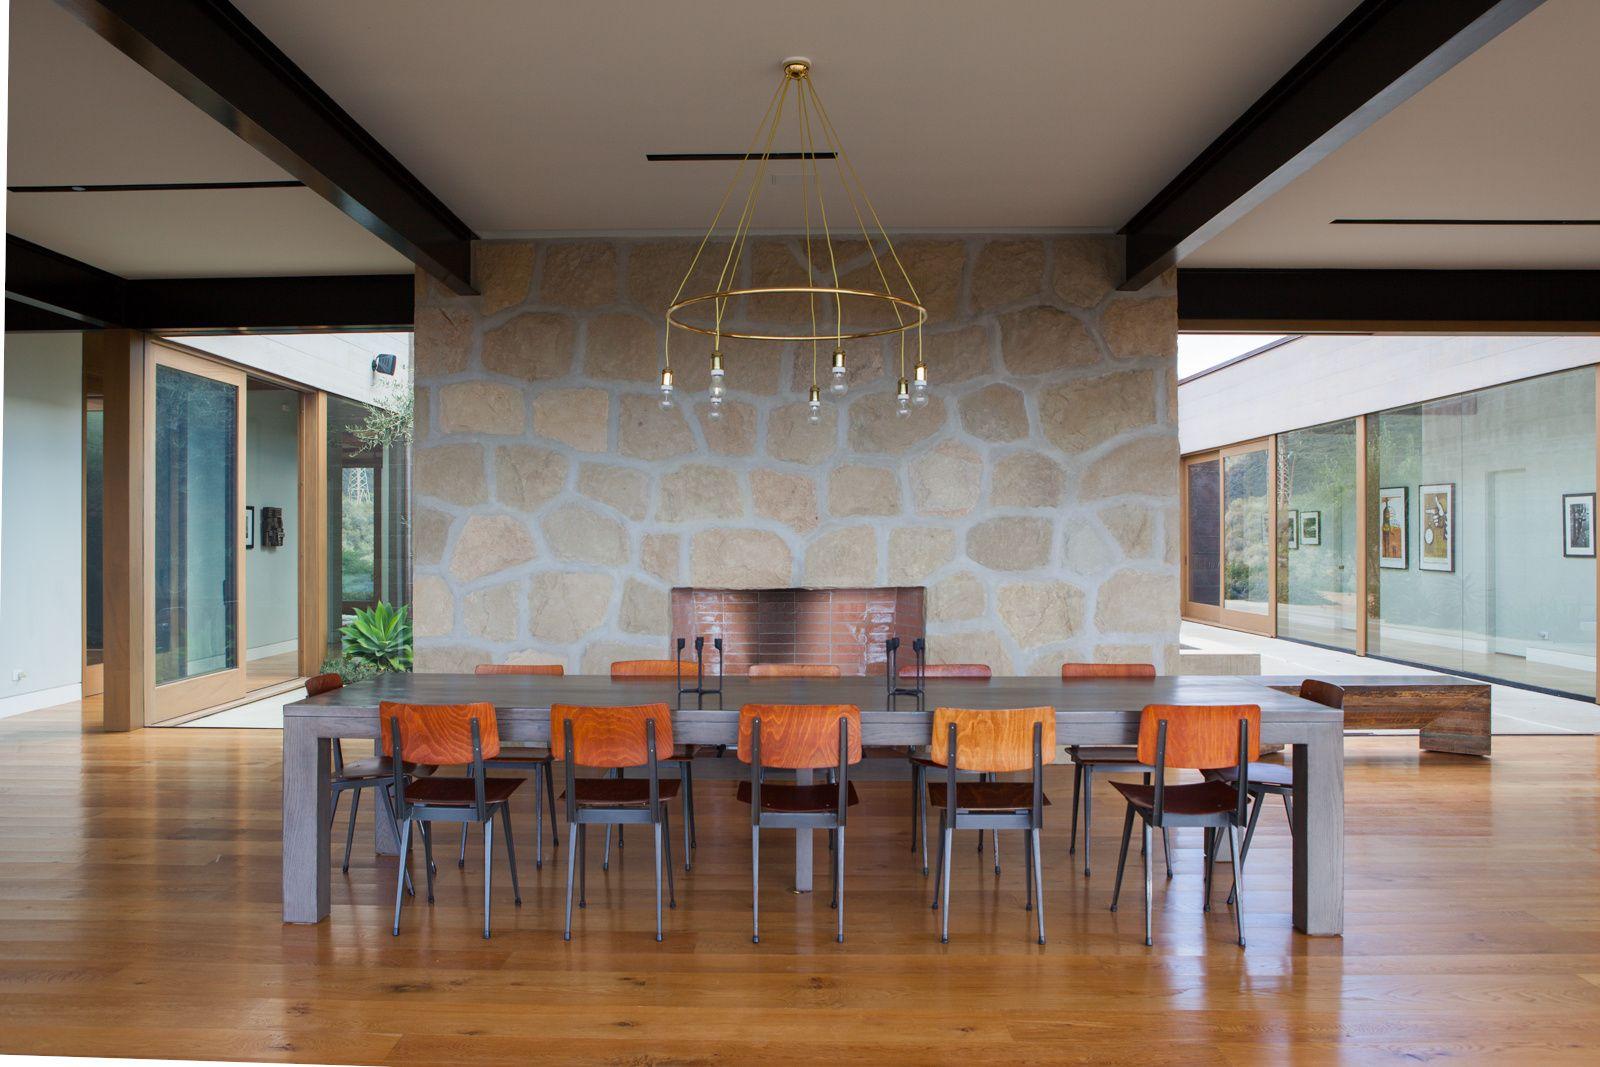 1158290003581577-laurejolietphoto-6785.jpg   House interior